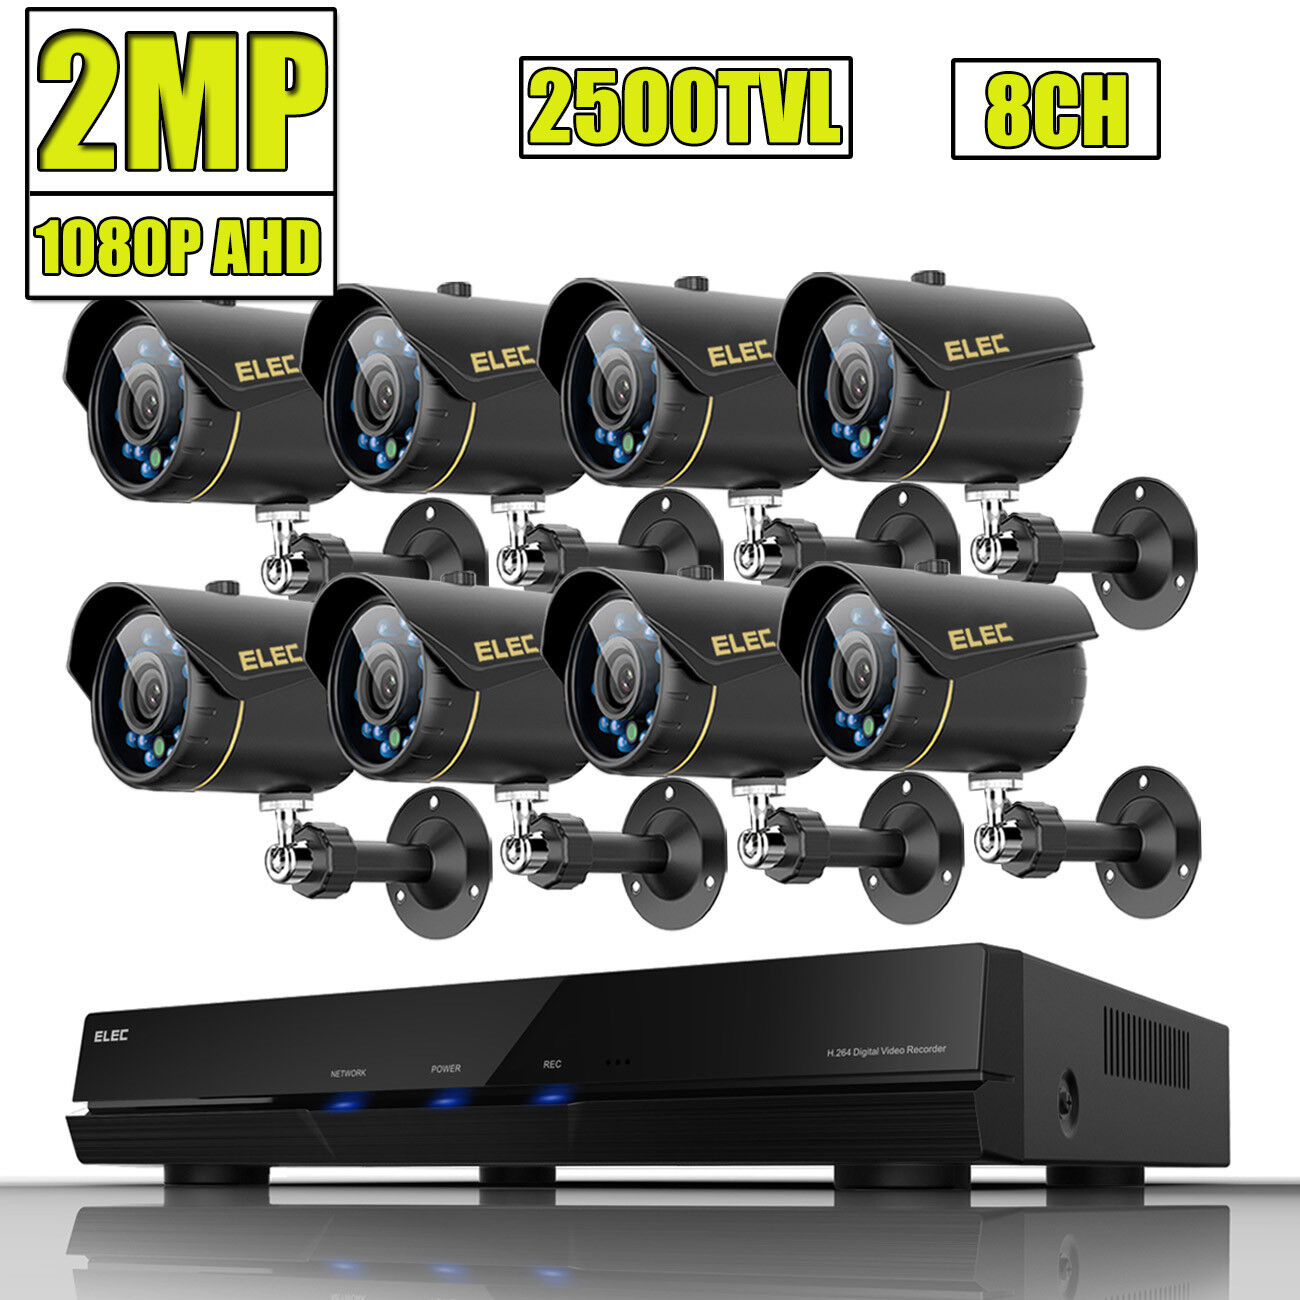 ELEC 8CH 1080N HDMI DVR 1080P AHD 2500TVL CCTV Video Security Camera System 2MP